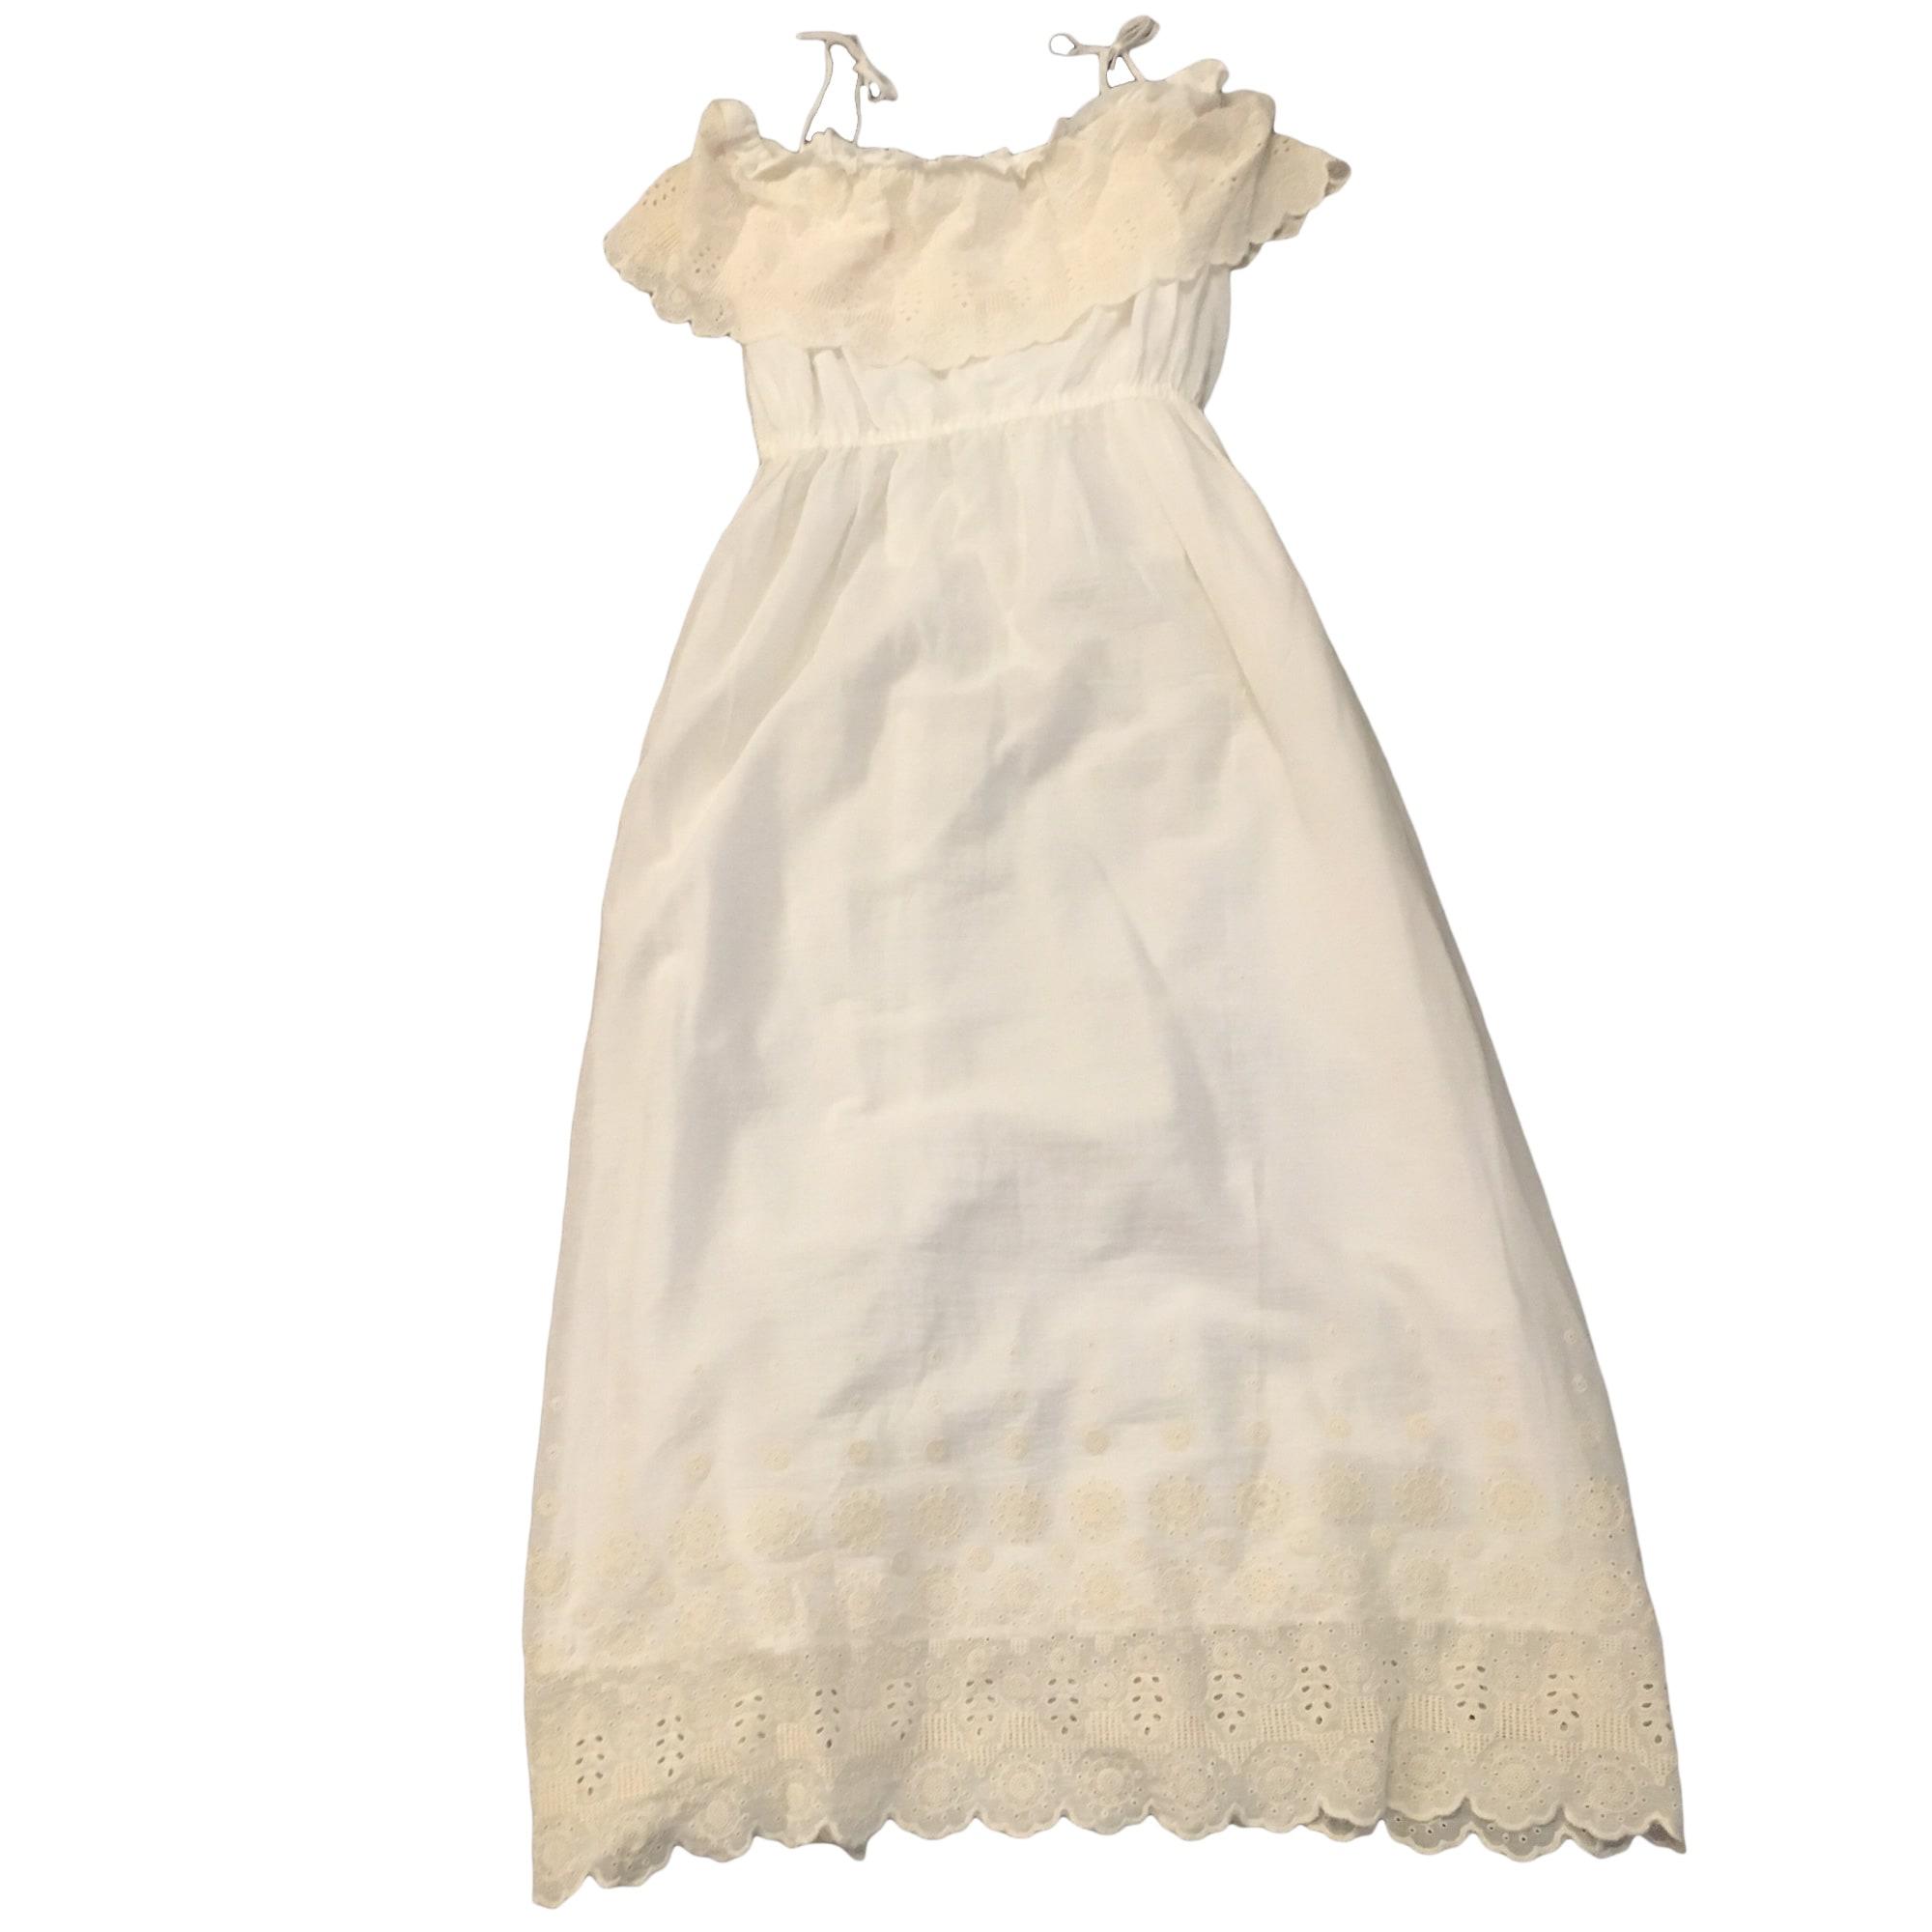 Robe longue comptoir des cotonniers 42 l xl t4 blanc - Robe longue comptoir des cotonniers ...